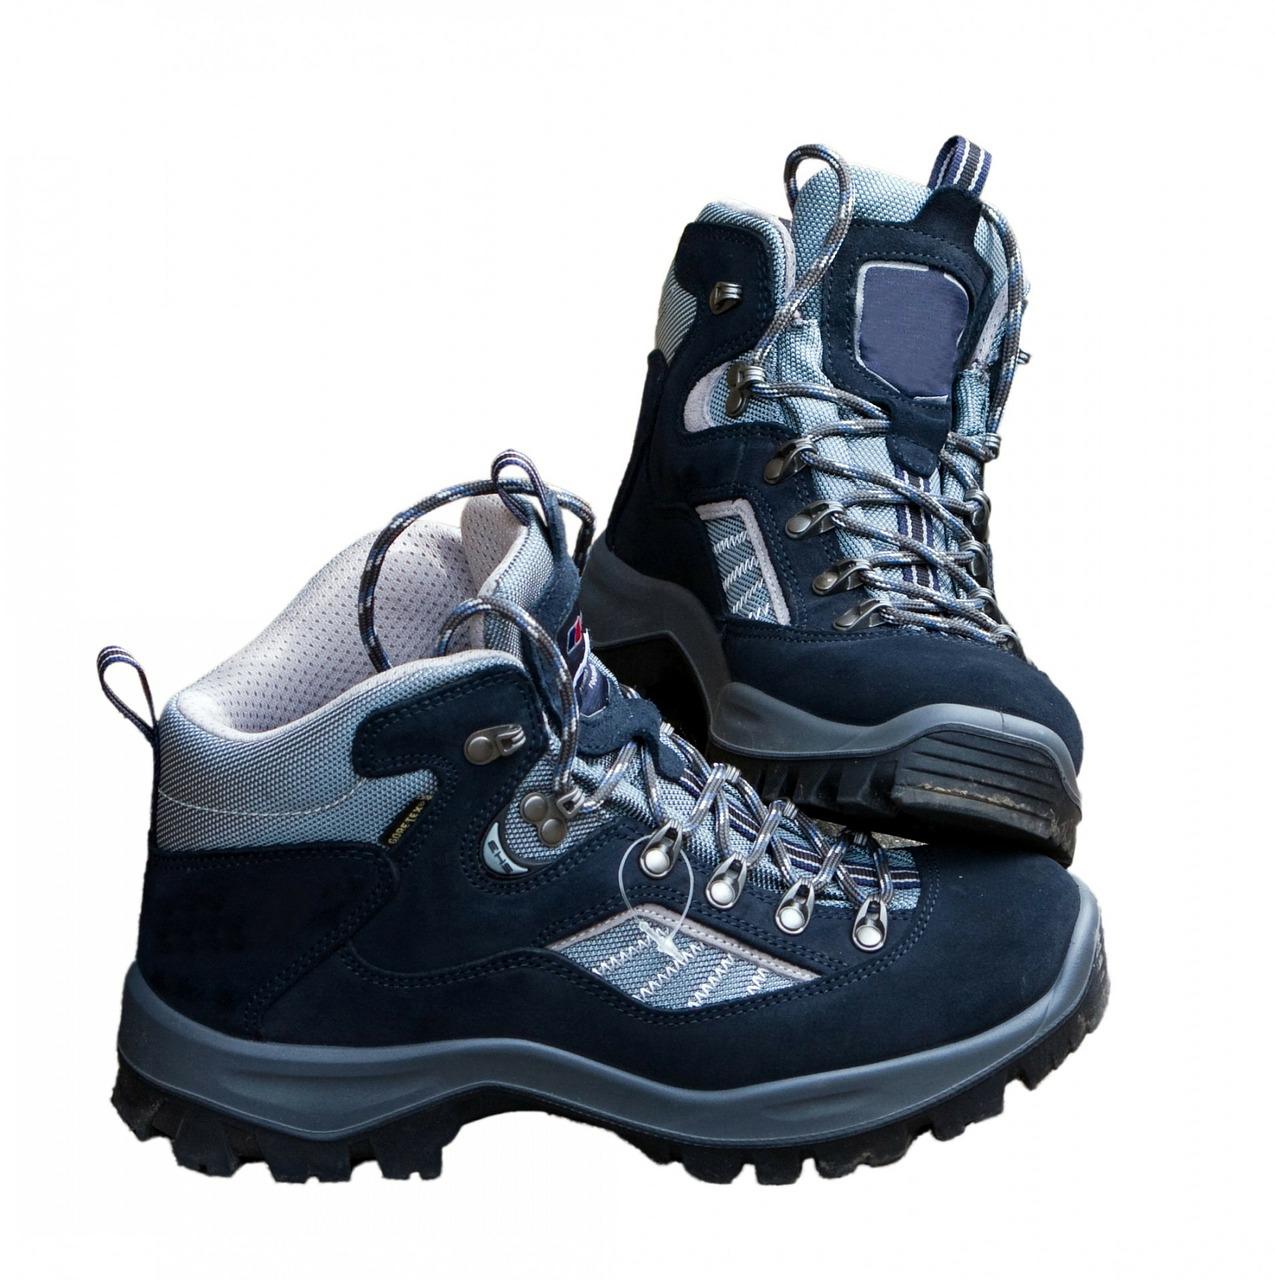 walking-boots-220499_1280